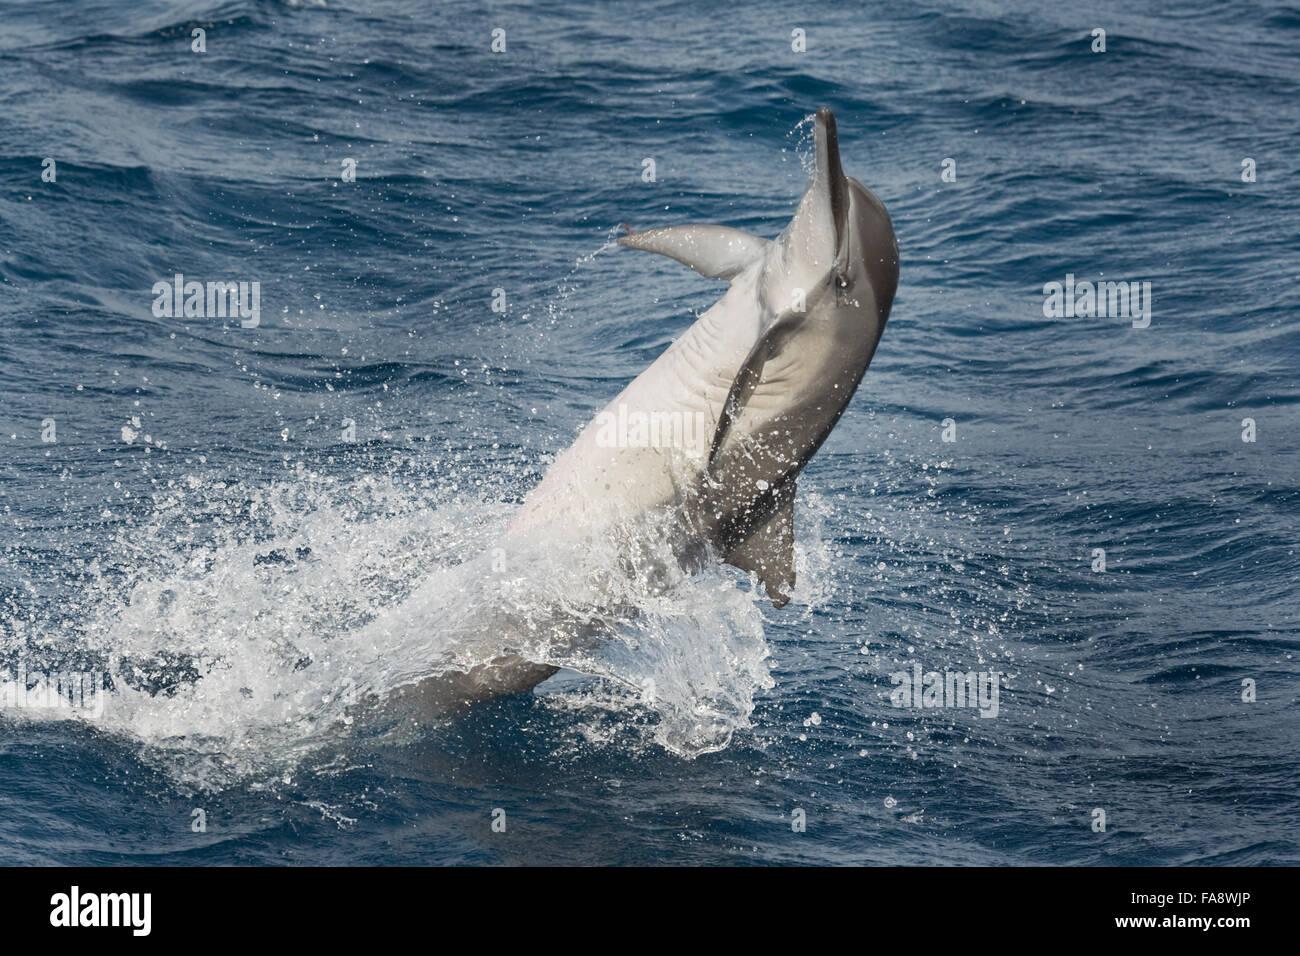 Hawaiian/grises, Delfines, Stenella longirostris, spinning, Maldivas, Océano Índico. Foto de stock